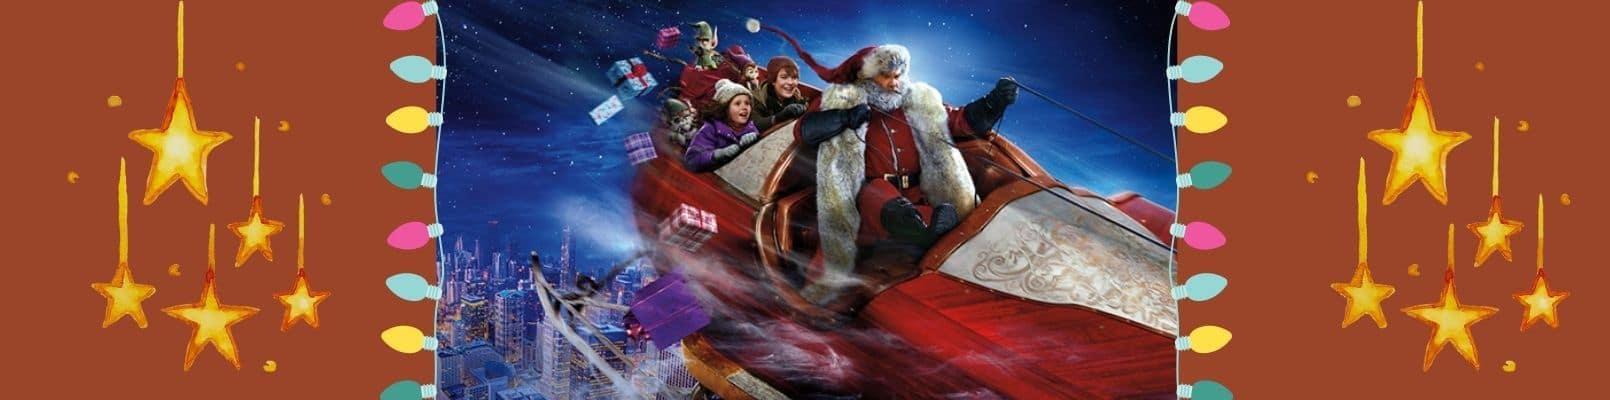 filme craciun netflix 2020 christmas chronicles